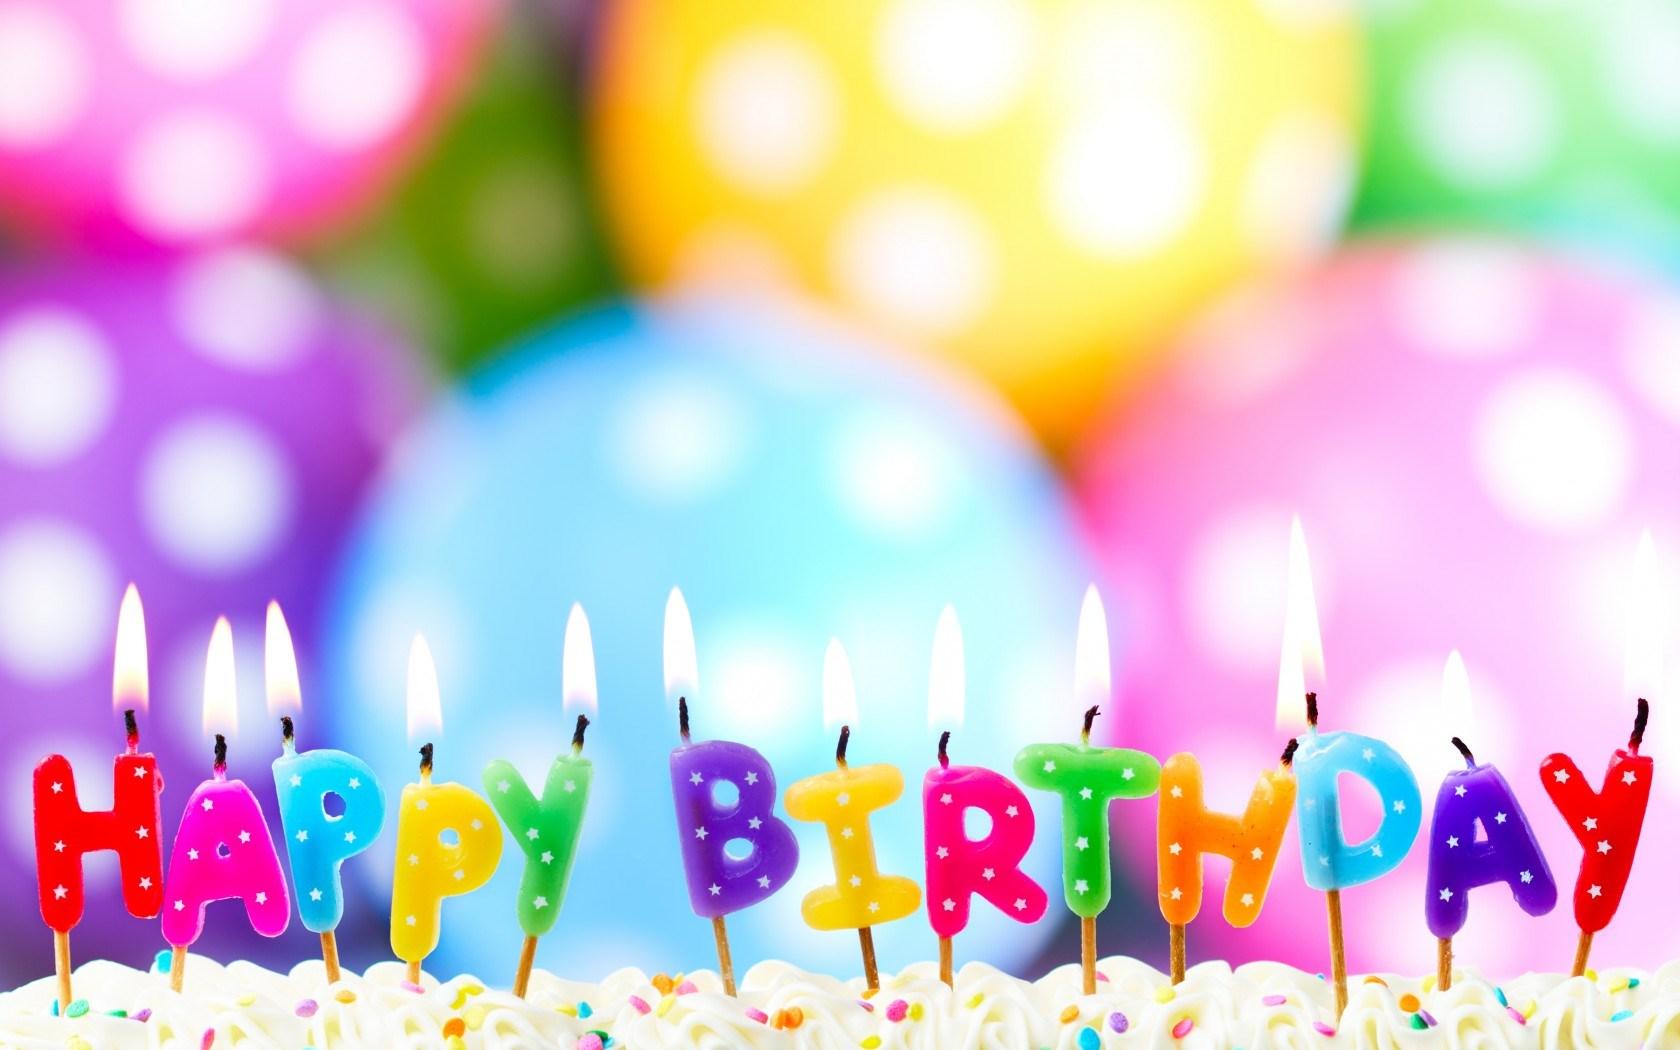 Cake Candles Happy Birthday 1680x1050